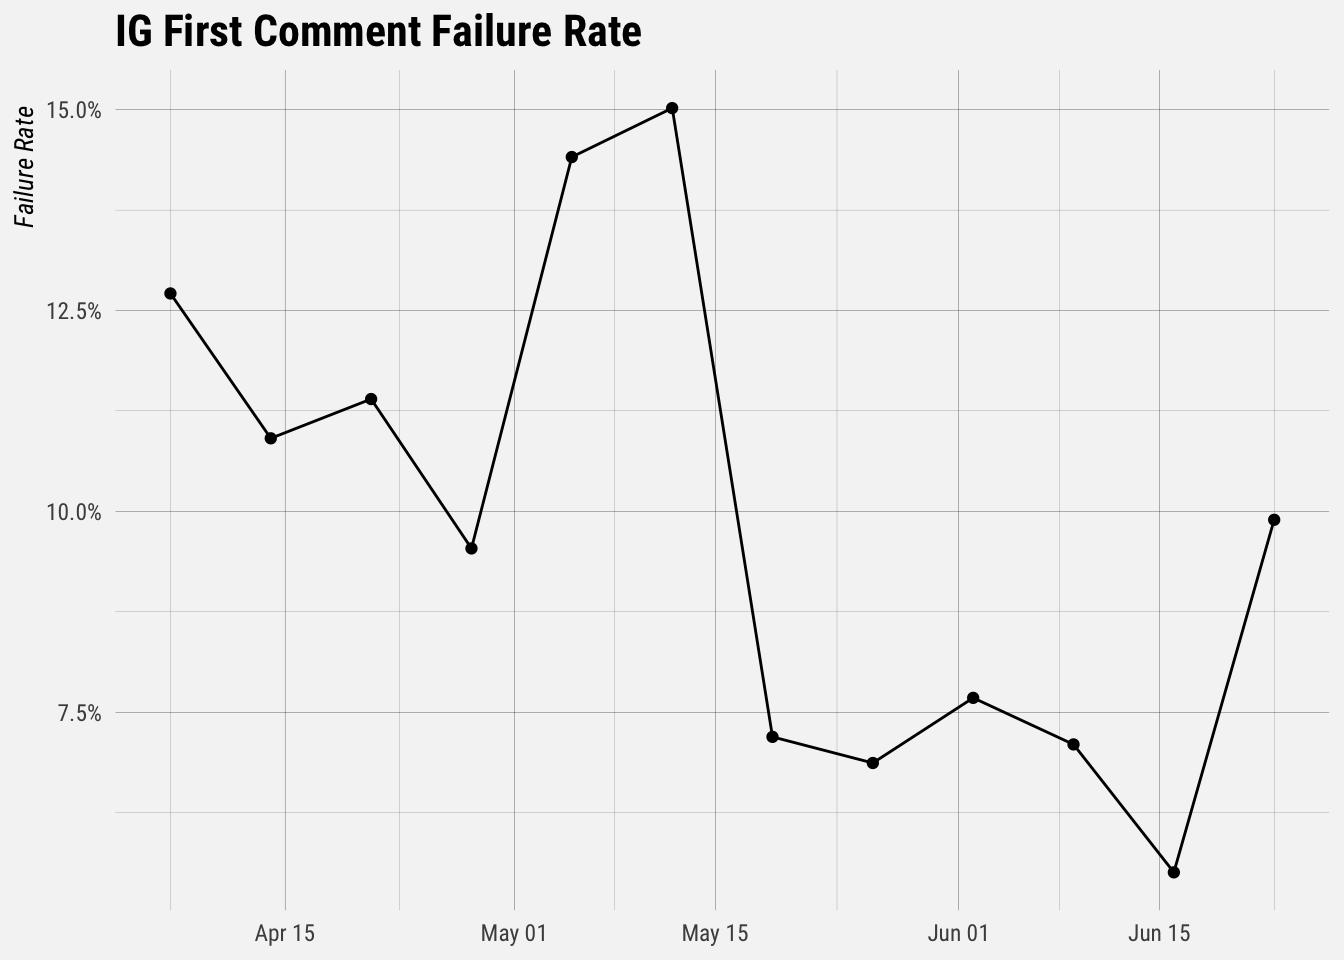 Alpha Krav Maga Manchester Ct investigating failed instagram comments - buffer's data blog